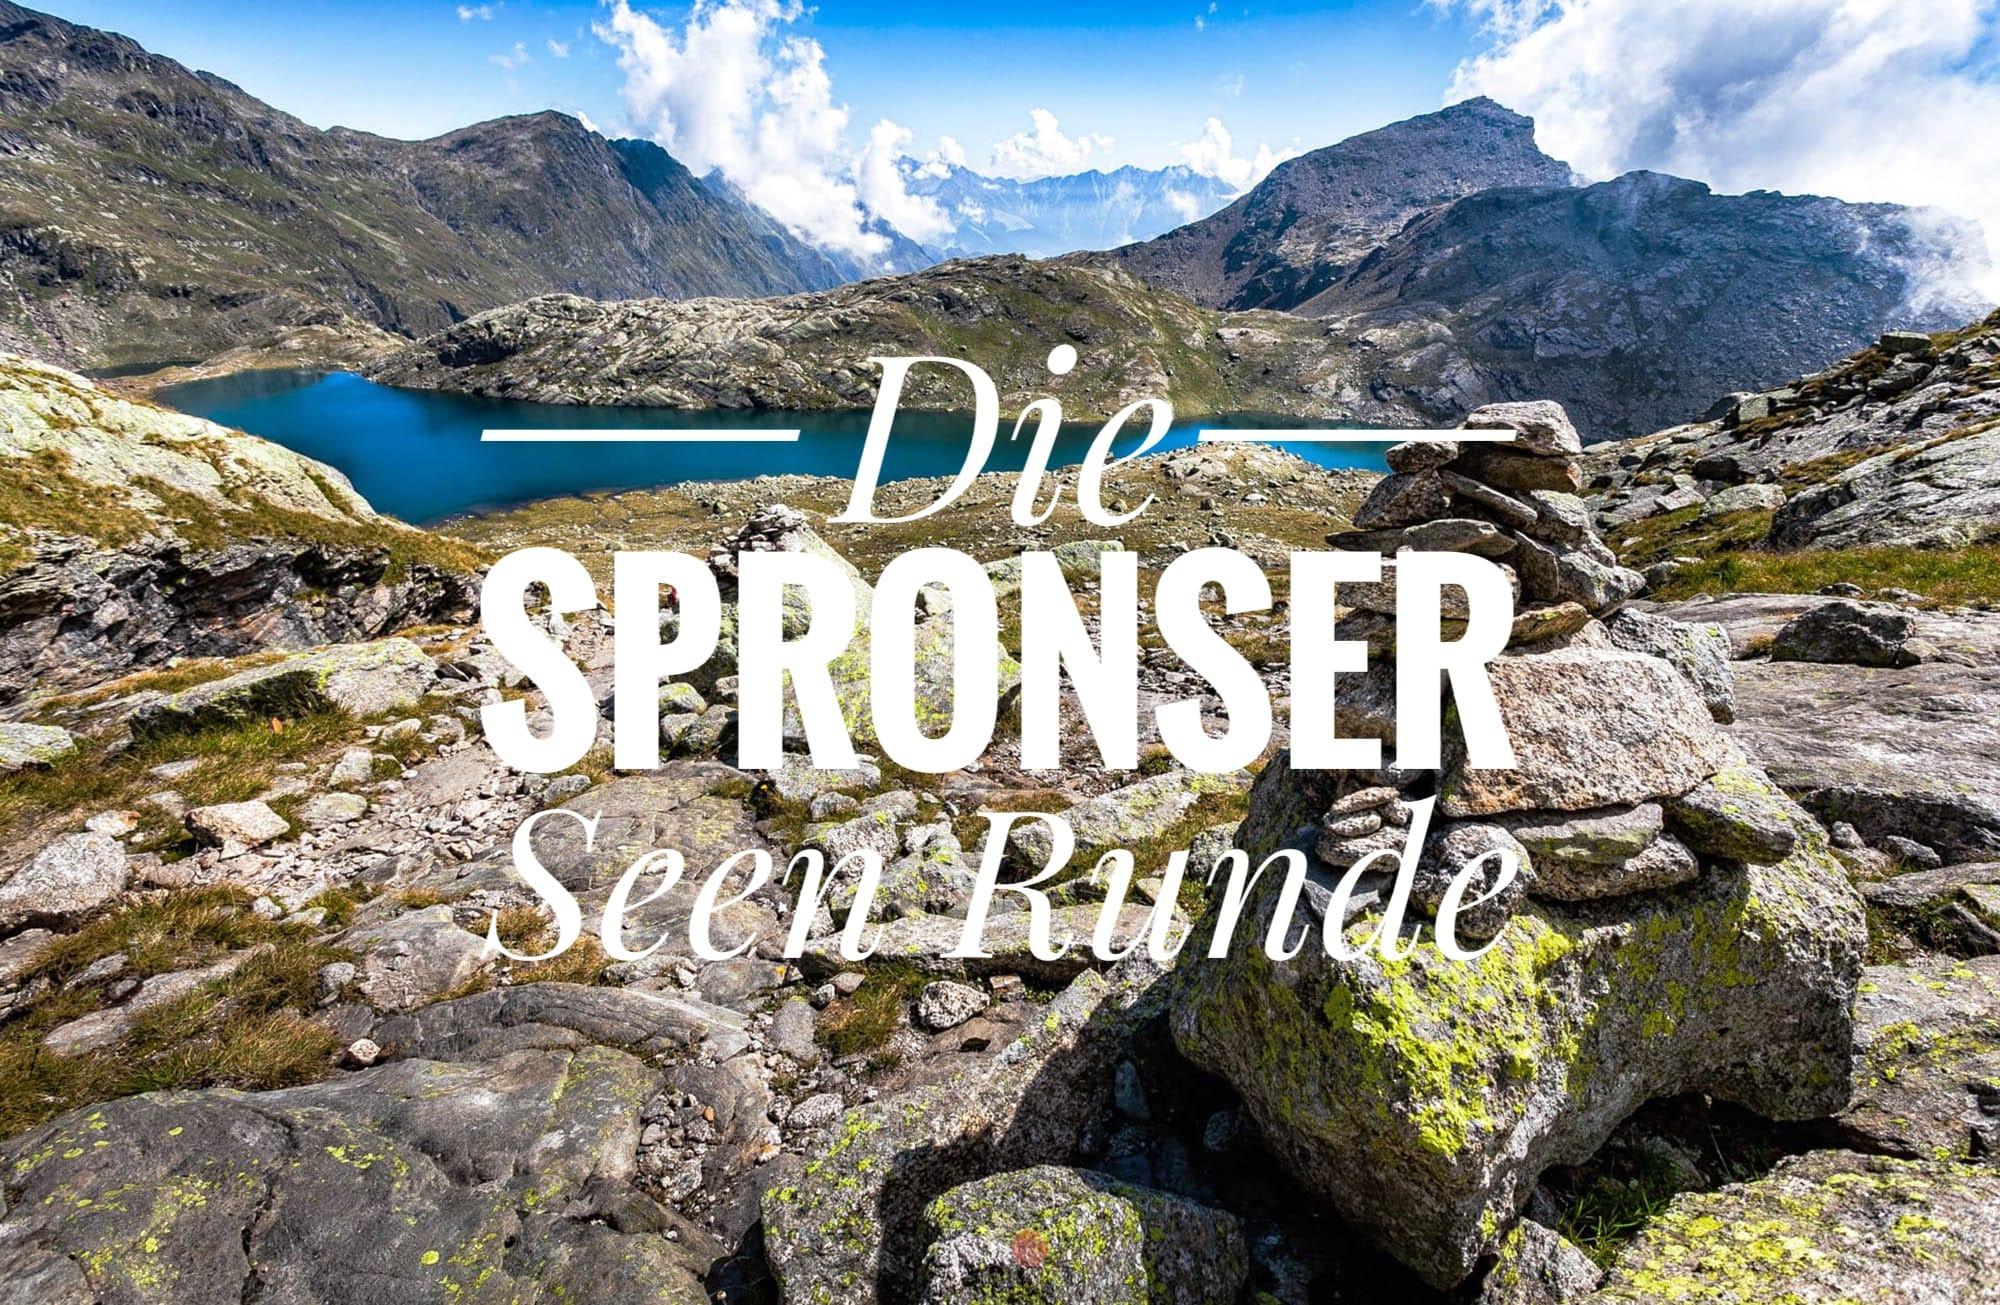 Spronser Seen Runde – Wandern in der Texelgruppe